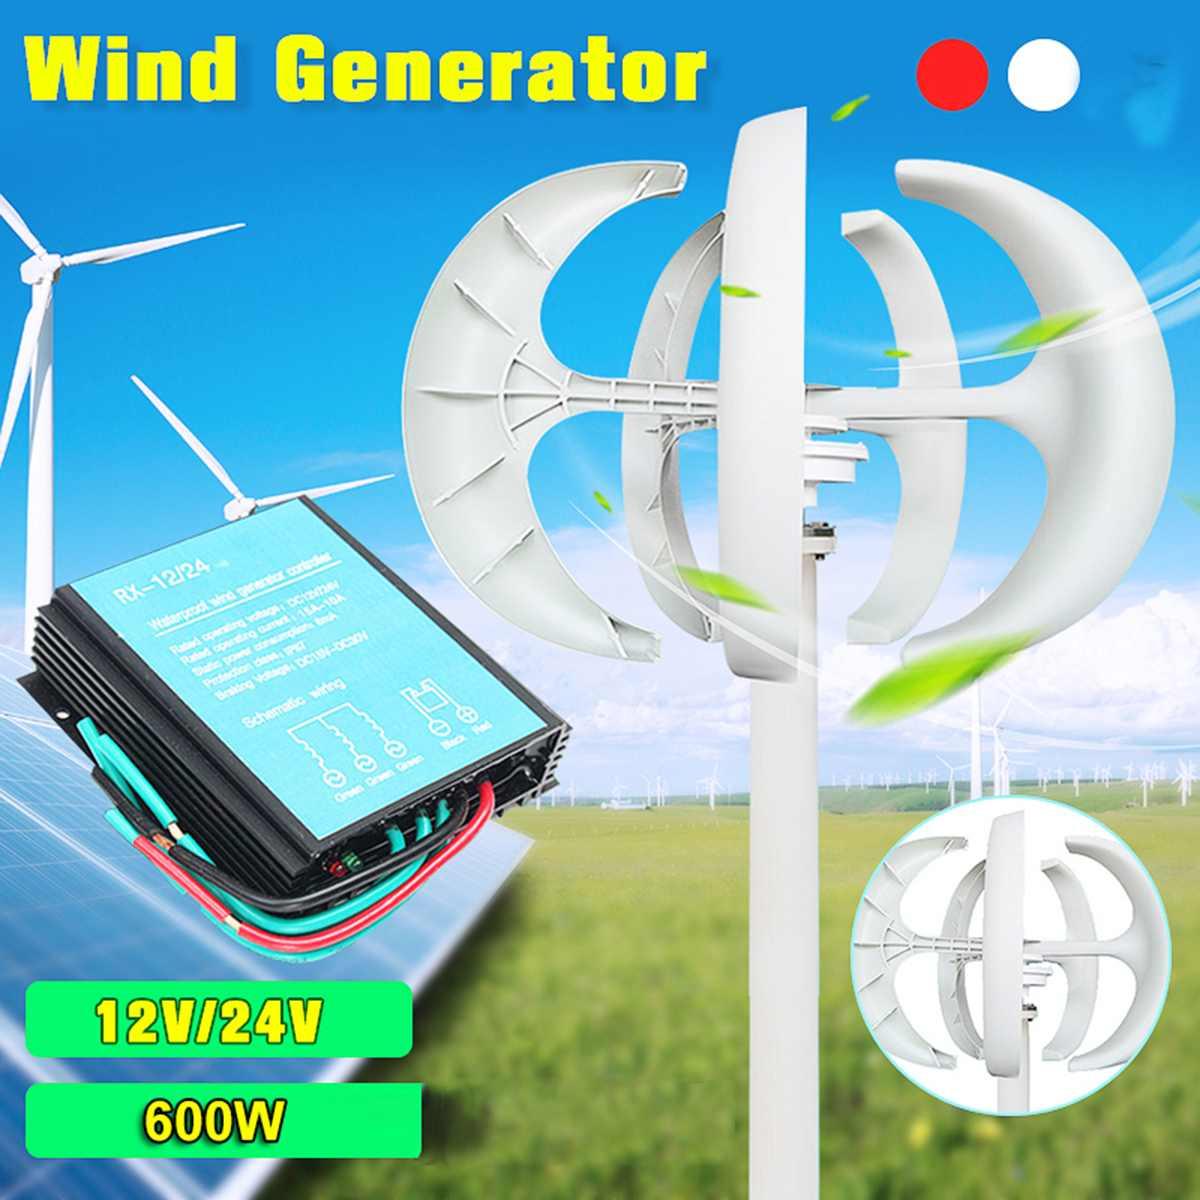 100 w/200 w/300 w/600 W 12 24 V Vertical Axis Wind Generator Turbine VAWT barco Jardim com Controlador Casa Uso Residencial